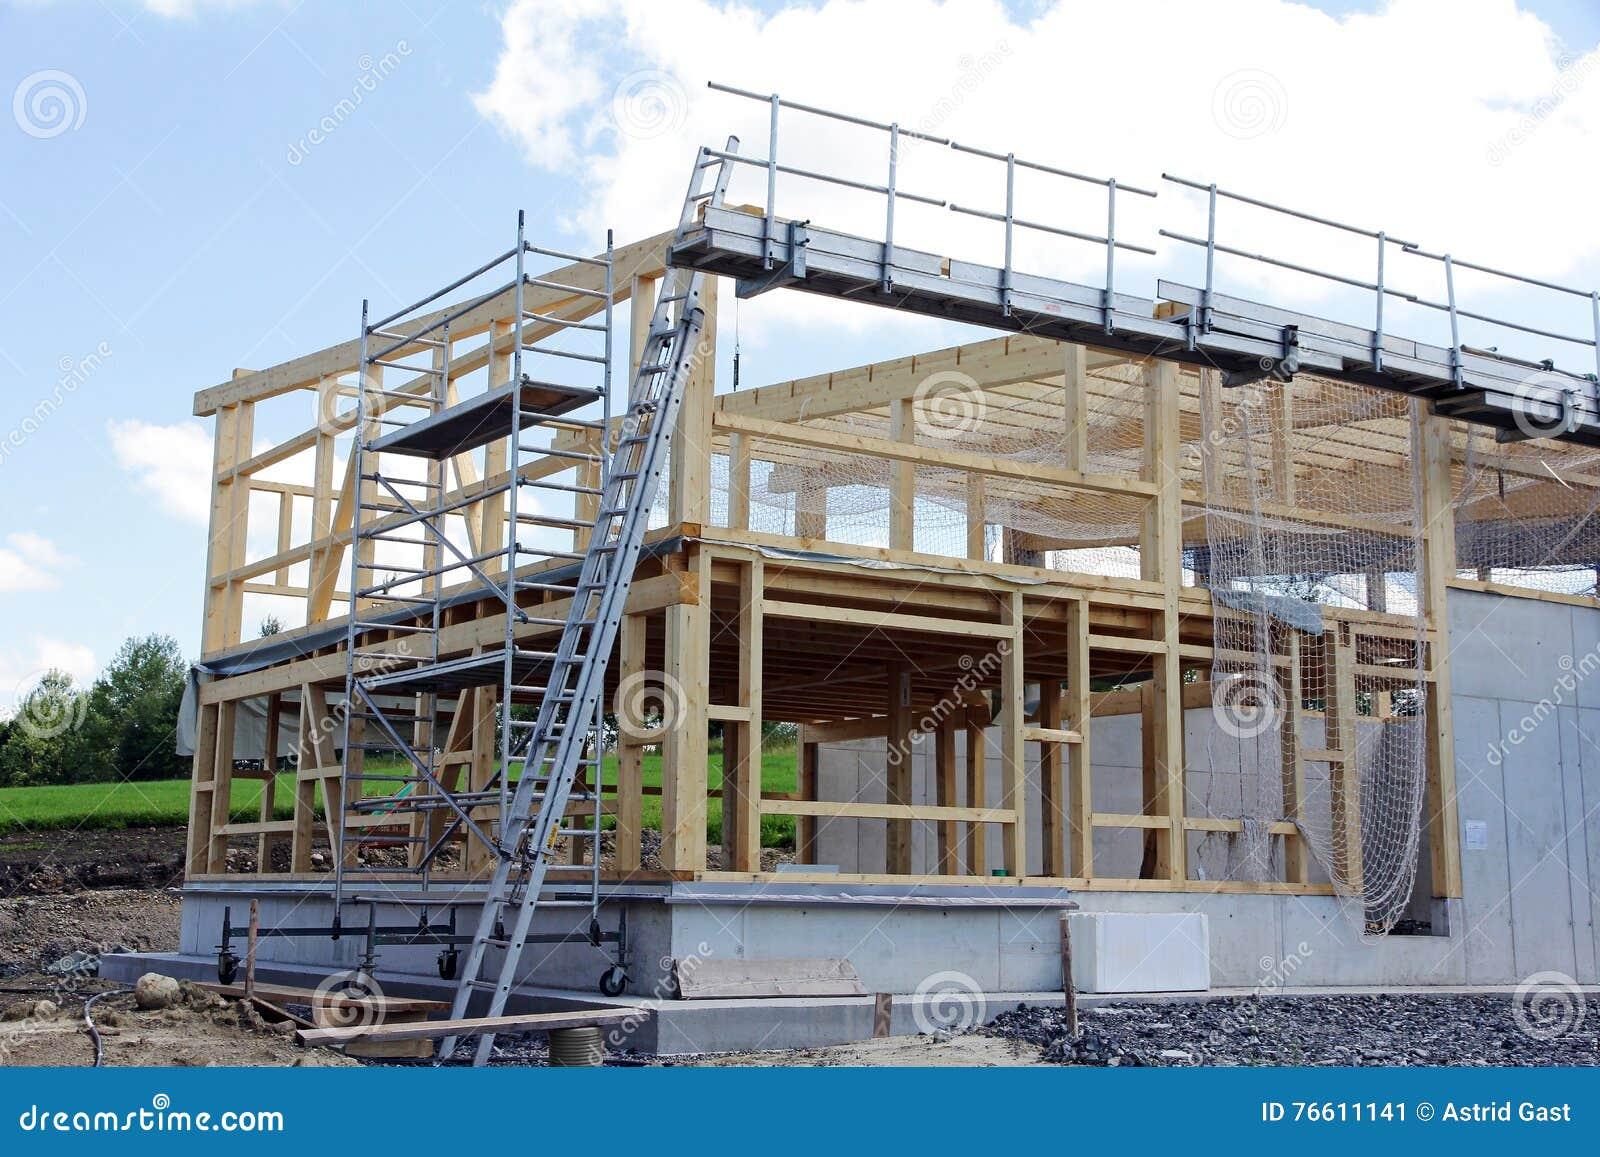 Costruzione di una casa di legno immagine stock immagine for Una pianta della casa di legno